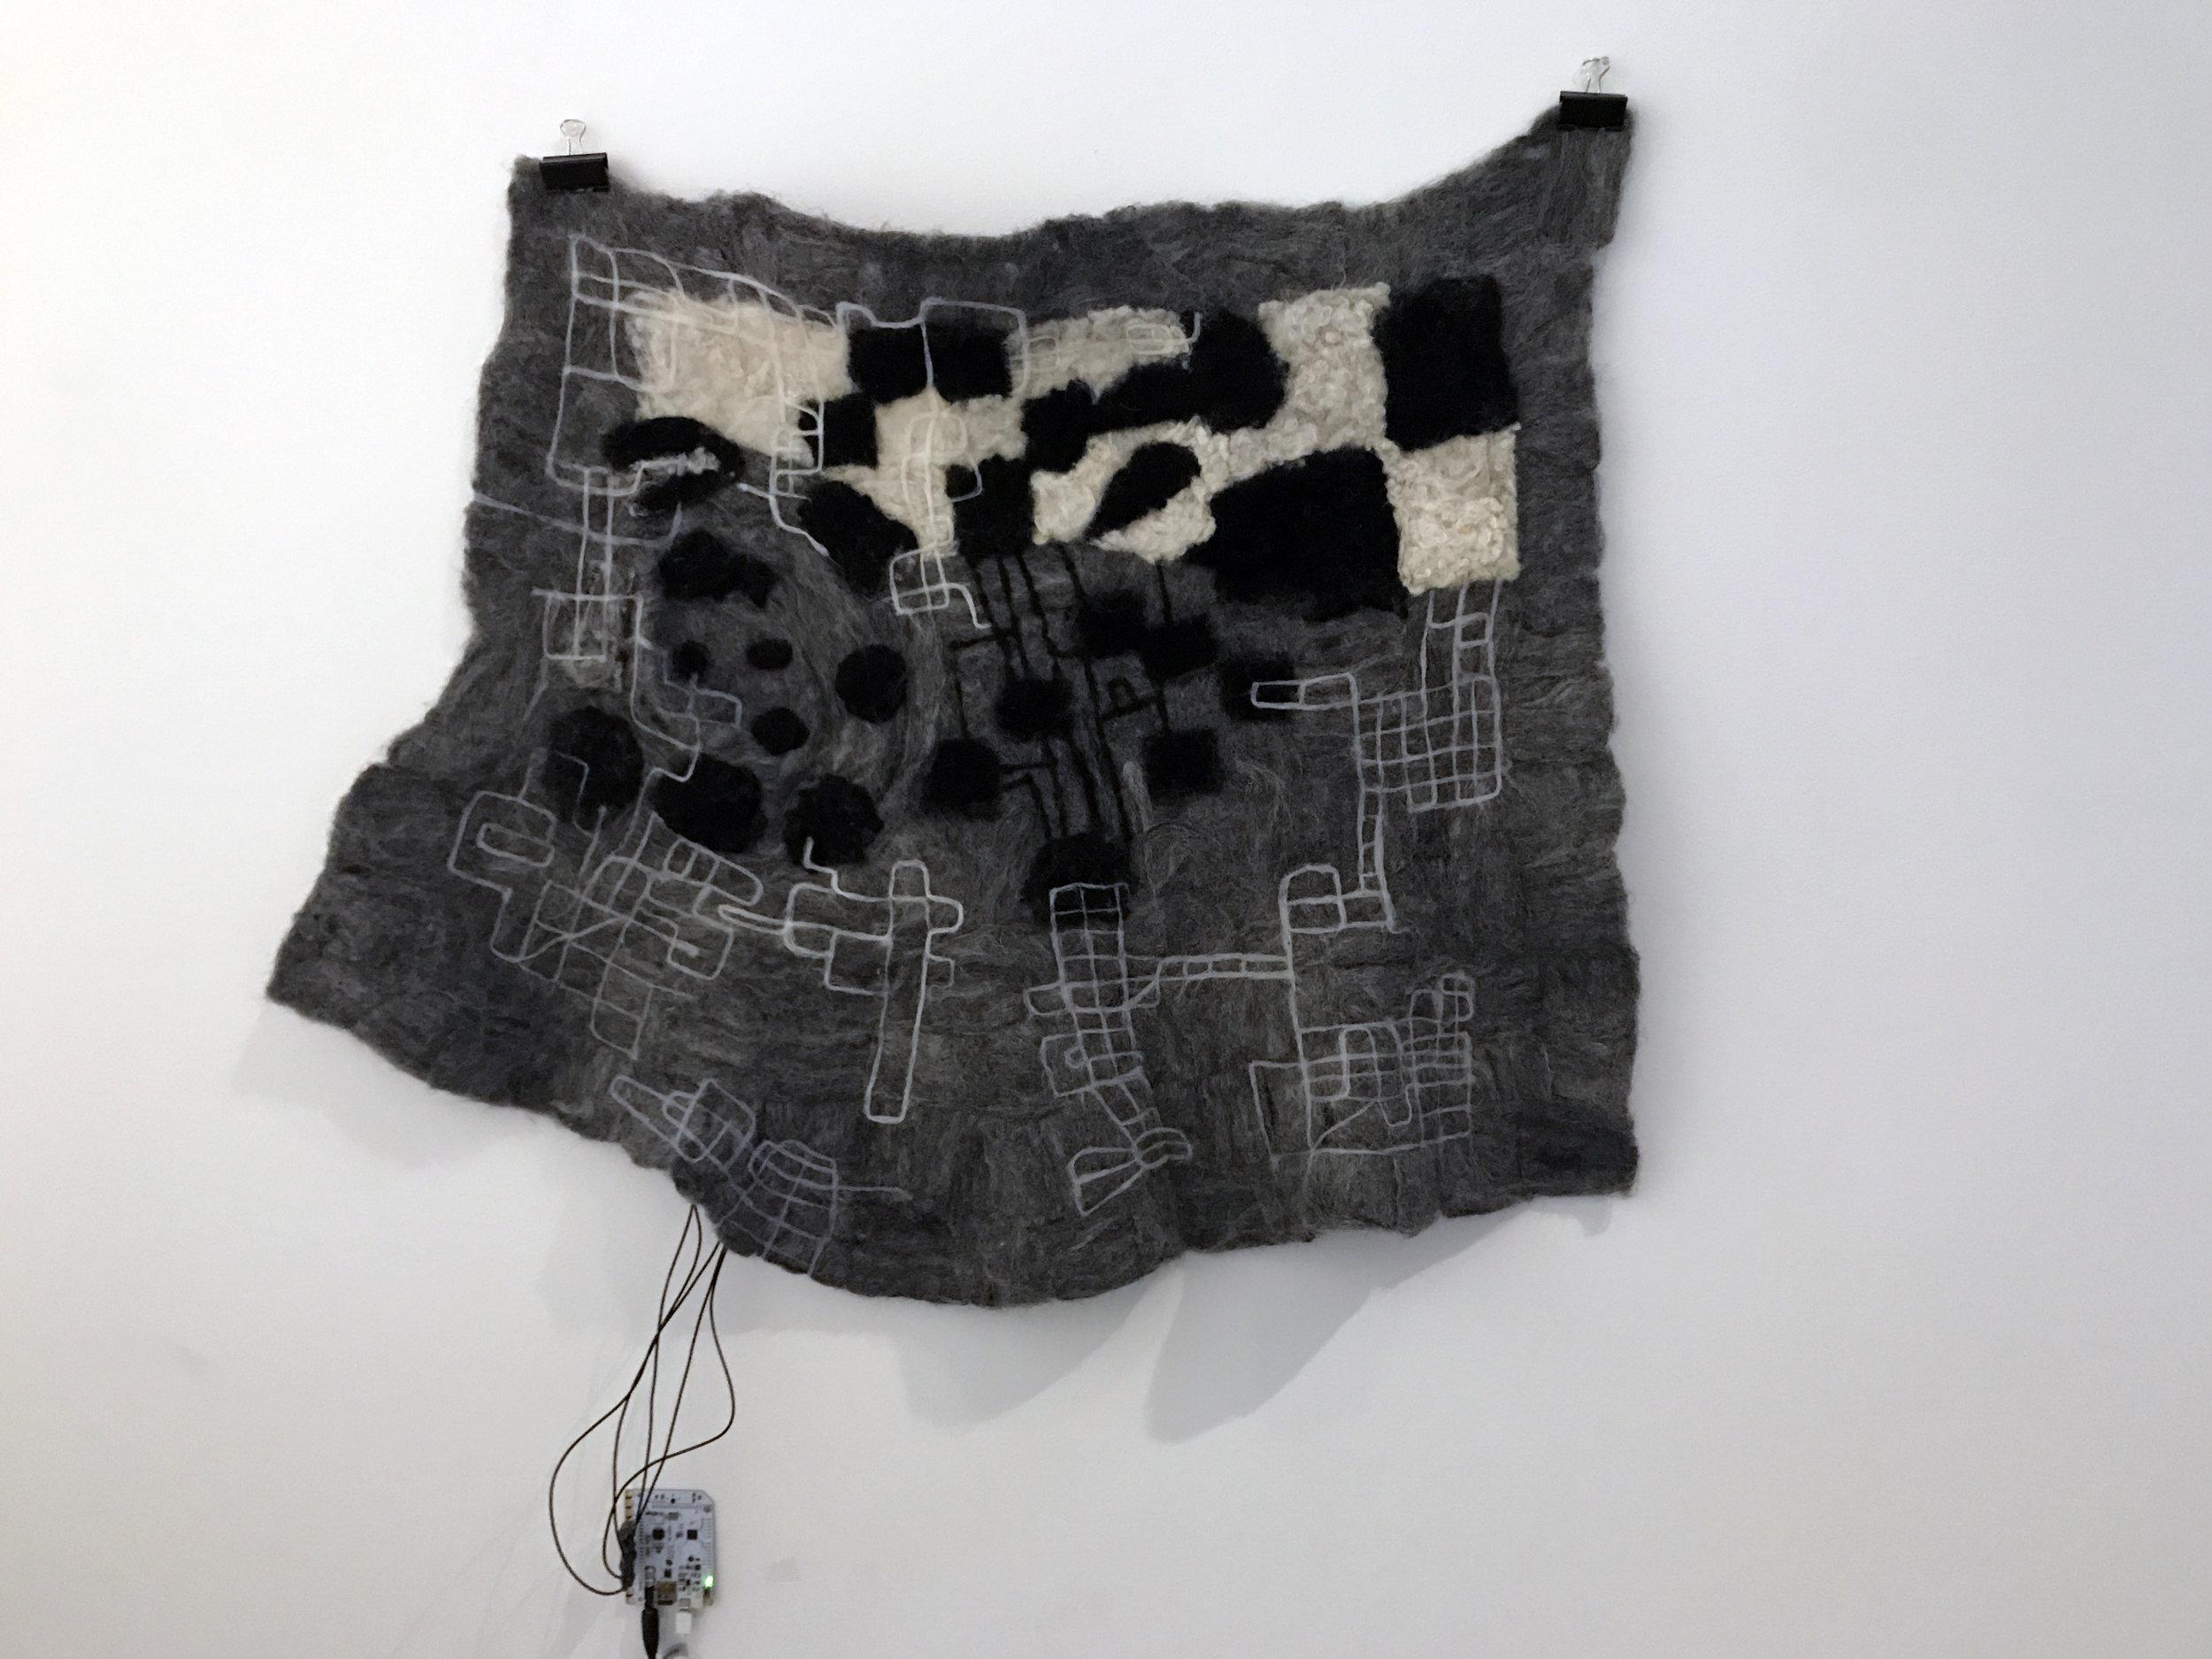 Felt 2017 | Merino wool, stainless steel fibre, micro controller, speaker | Dimensions variable (felt piece 33 x 74 cm)